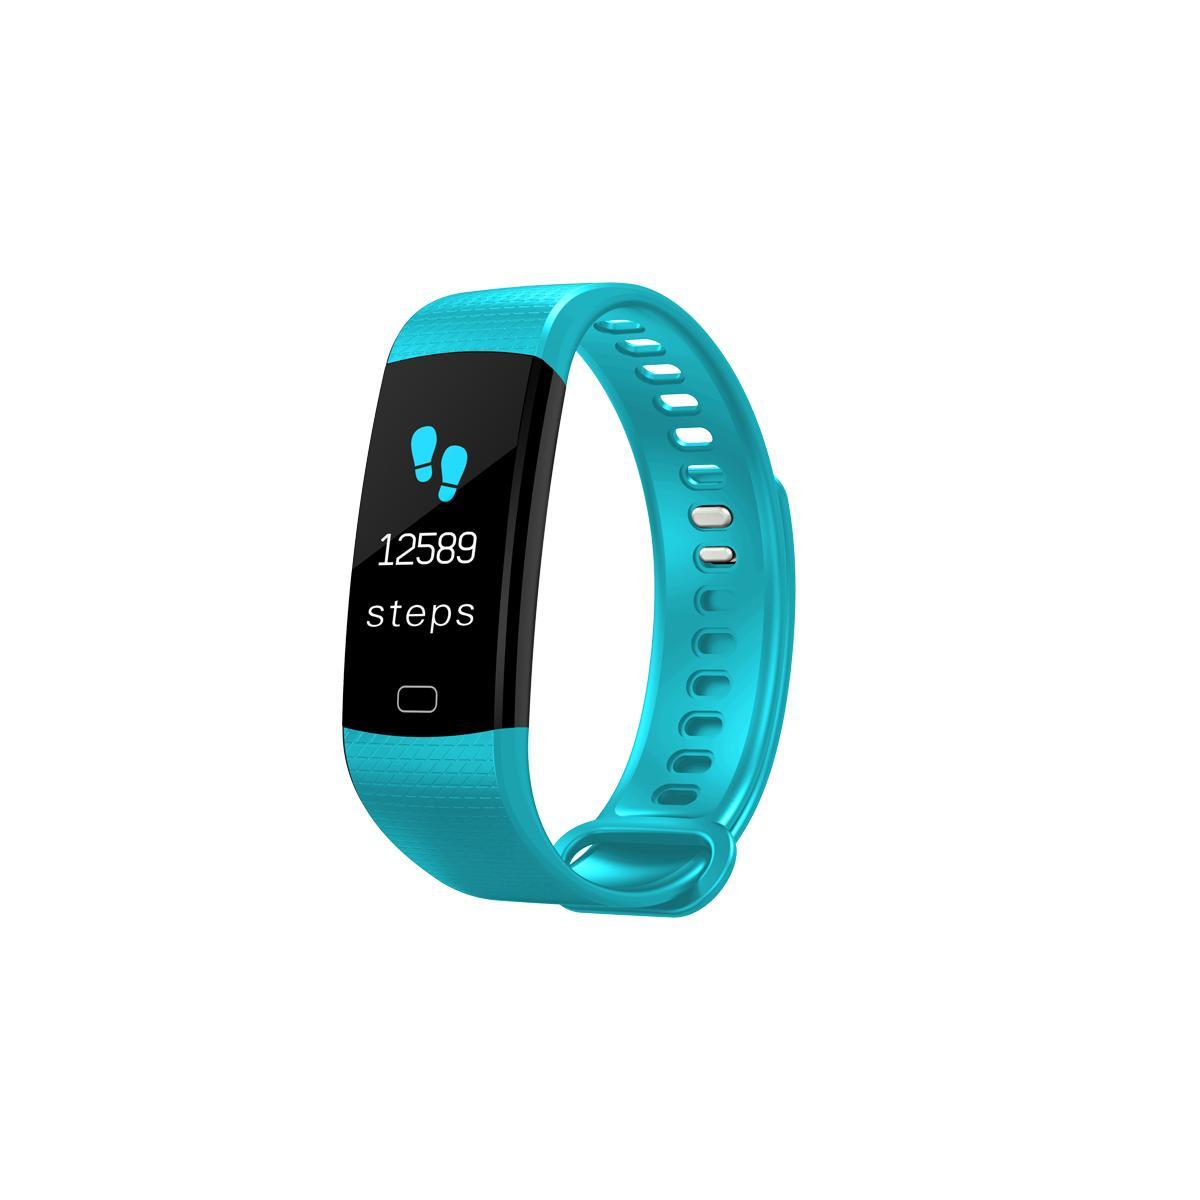 Bluetooth Smart Wristband Y5C Pedometer Smart Watch Women Men Band Heart Rate Blood Pressure Monitor Fitness Tracker Bracelet Giá Cực Cool